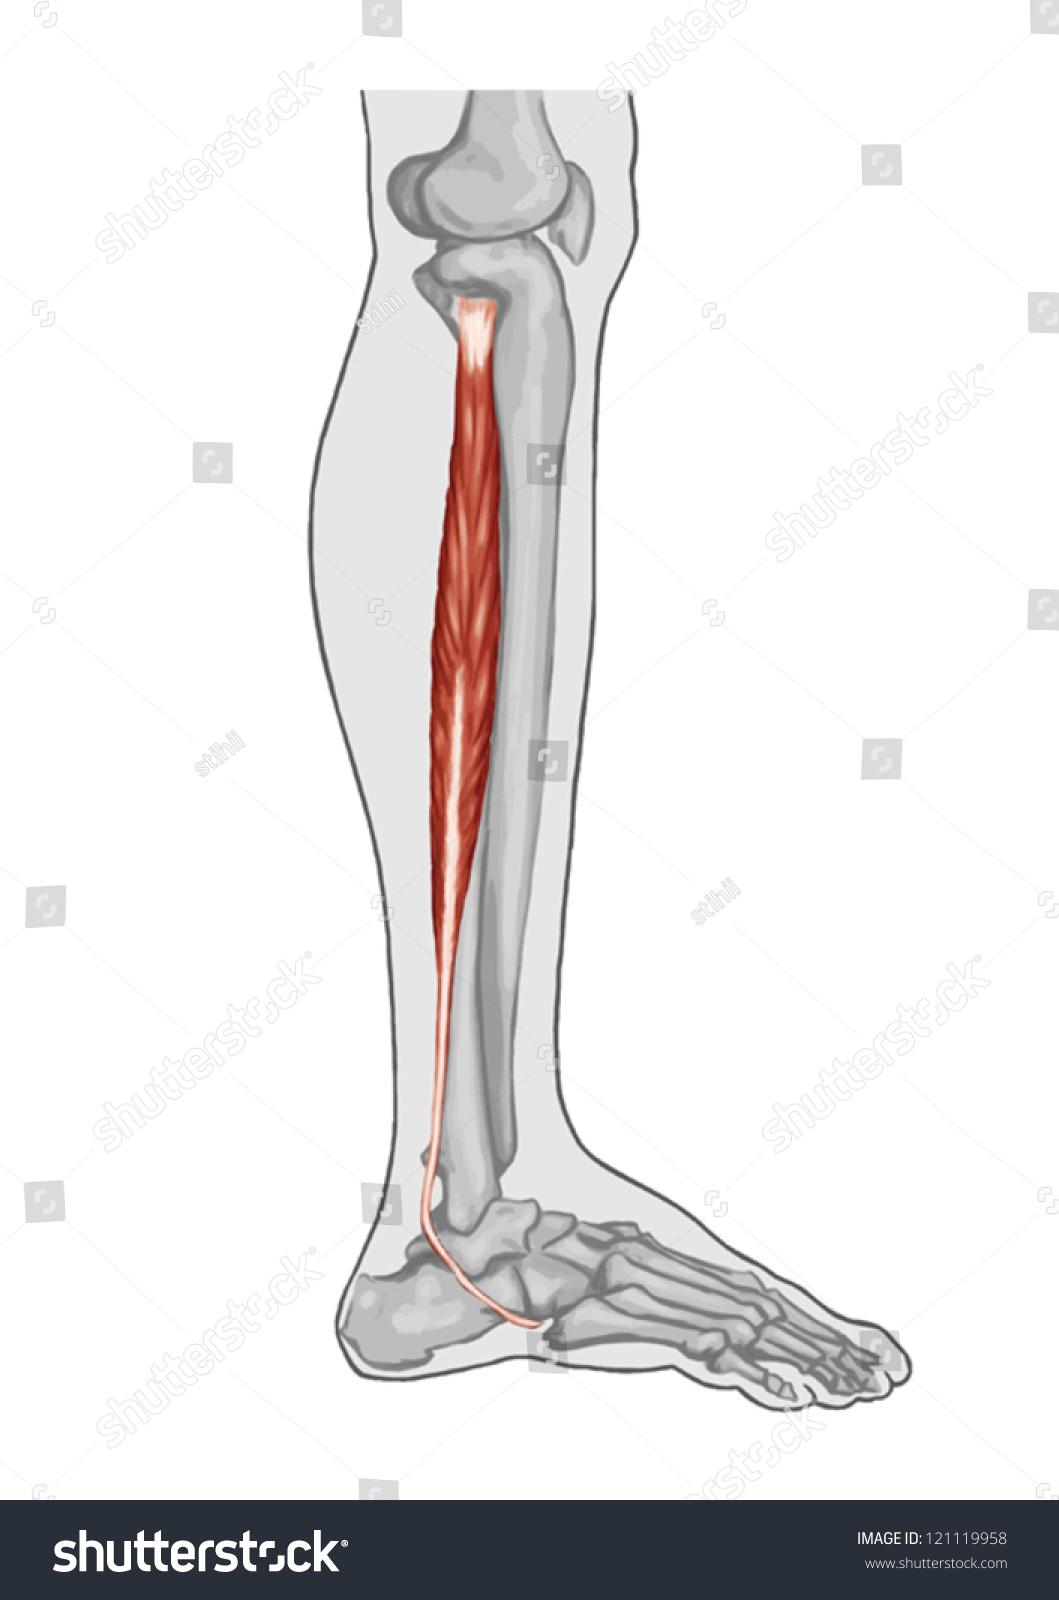 Fibularis Peroneus Longus Anatomy Leg Foot Stock Vector Royalty